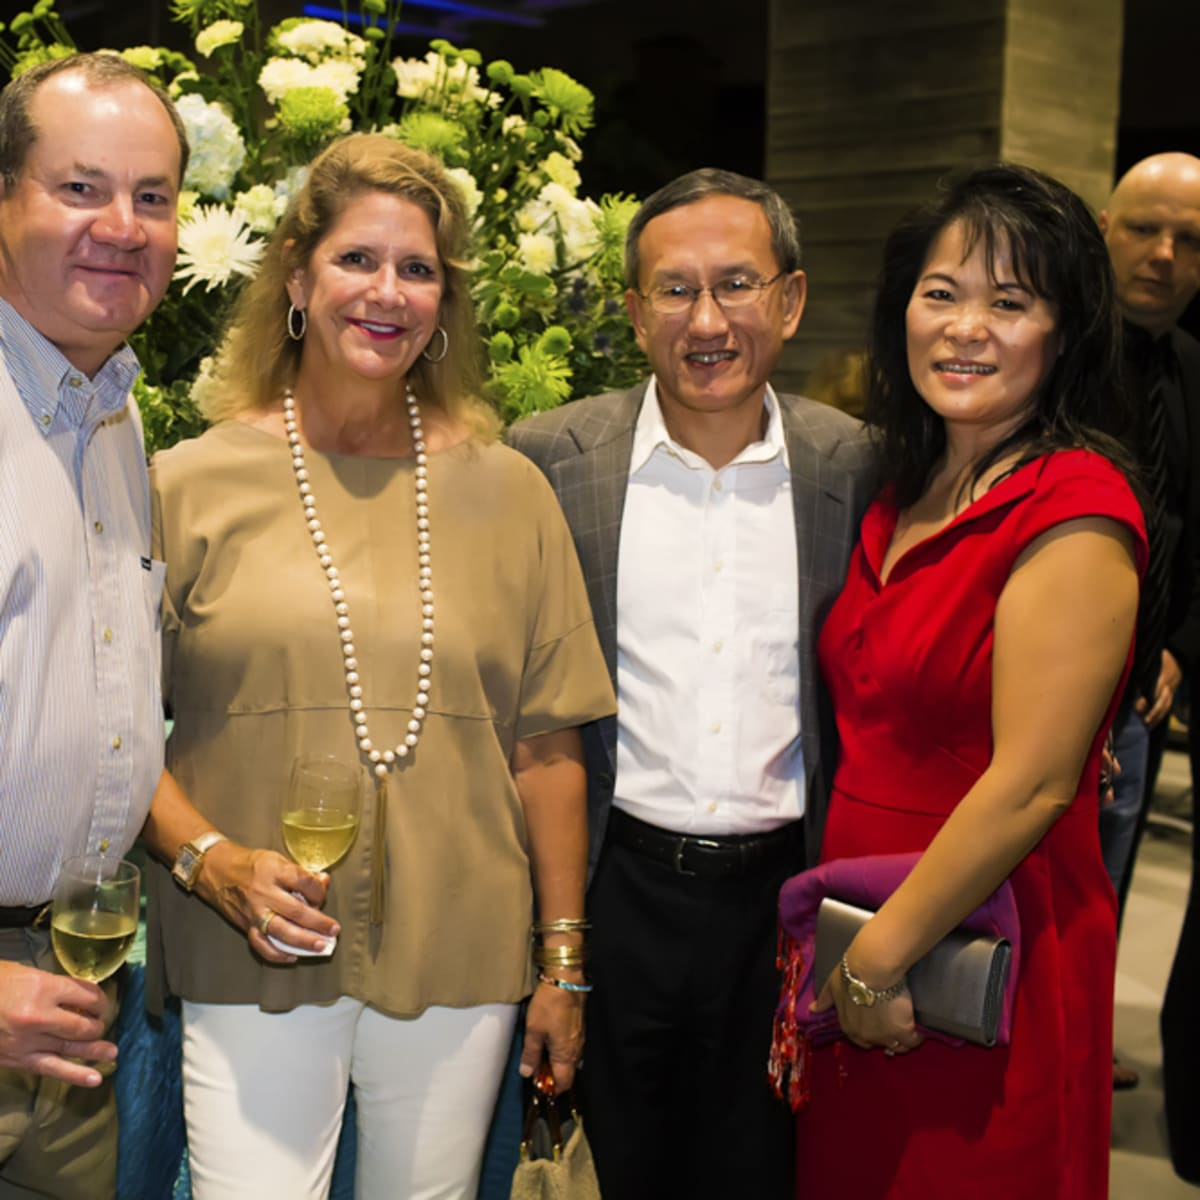 News, Shelby, Buffalo Bayou Partnership gala, Nov. 2015, Jeff Hines, Wendy Hines, Leo Chen, Jennifer Chen